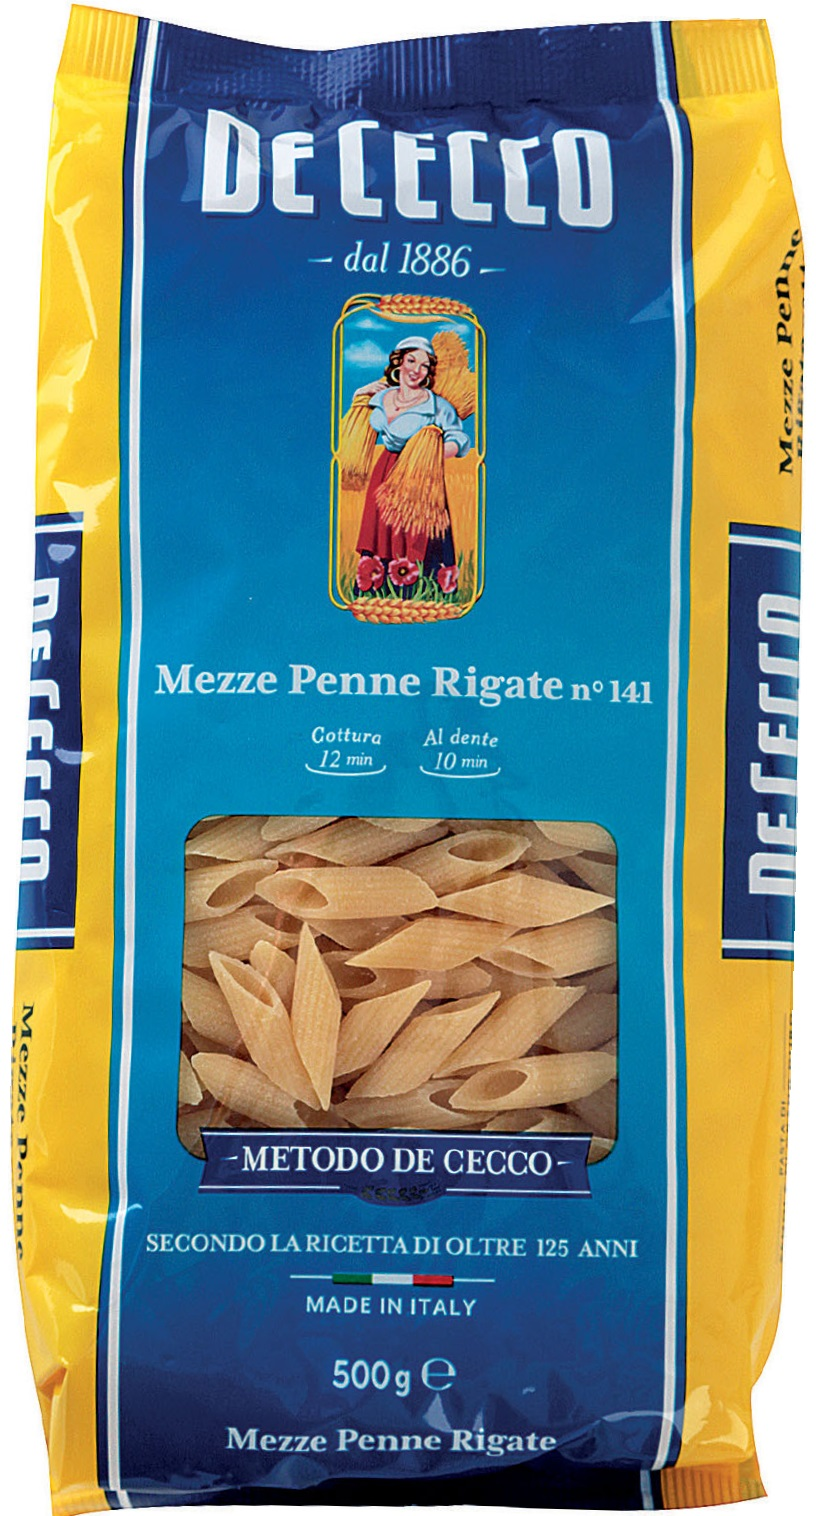 Pasta di semola De Cecco